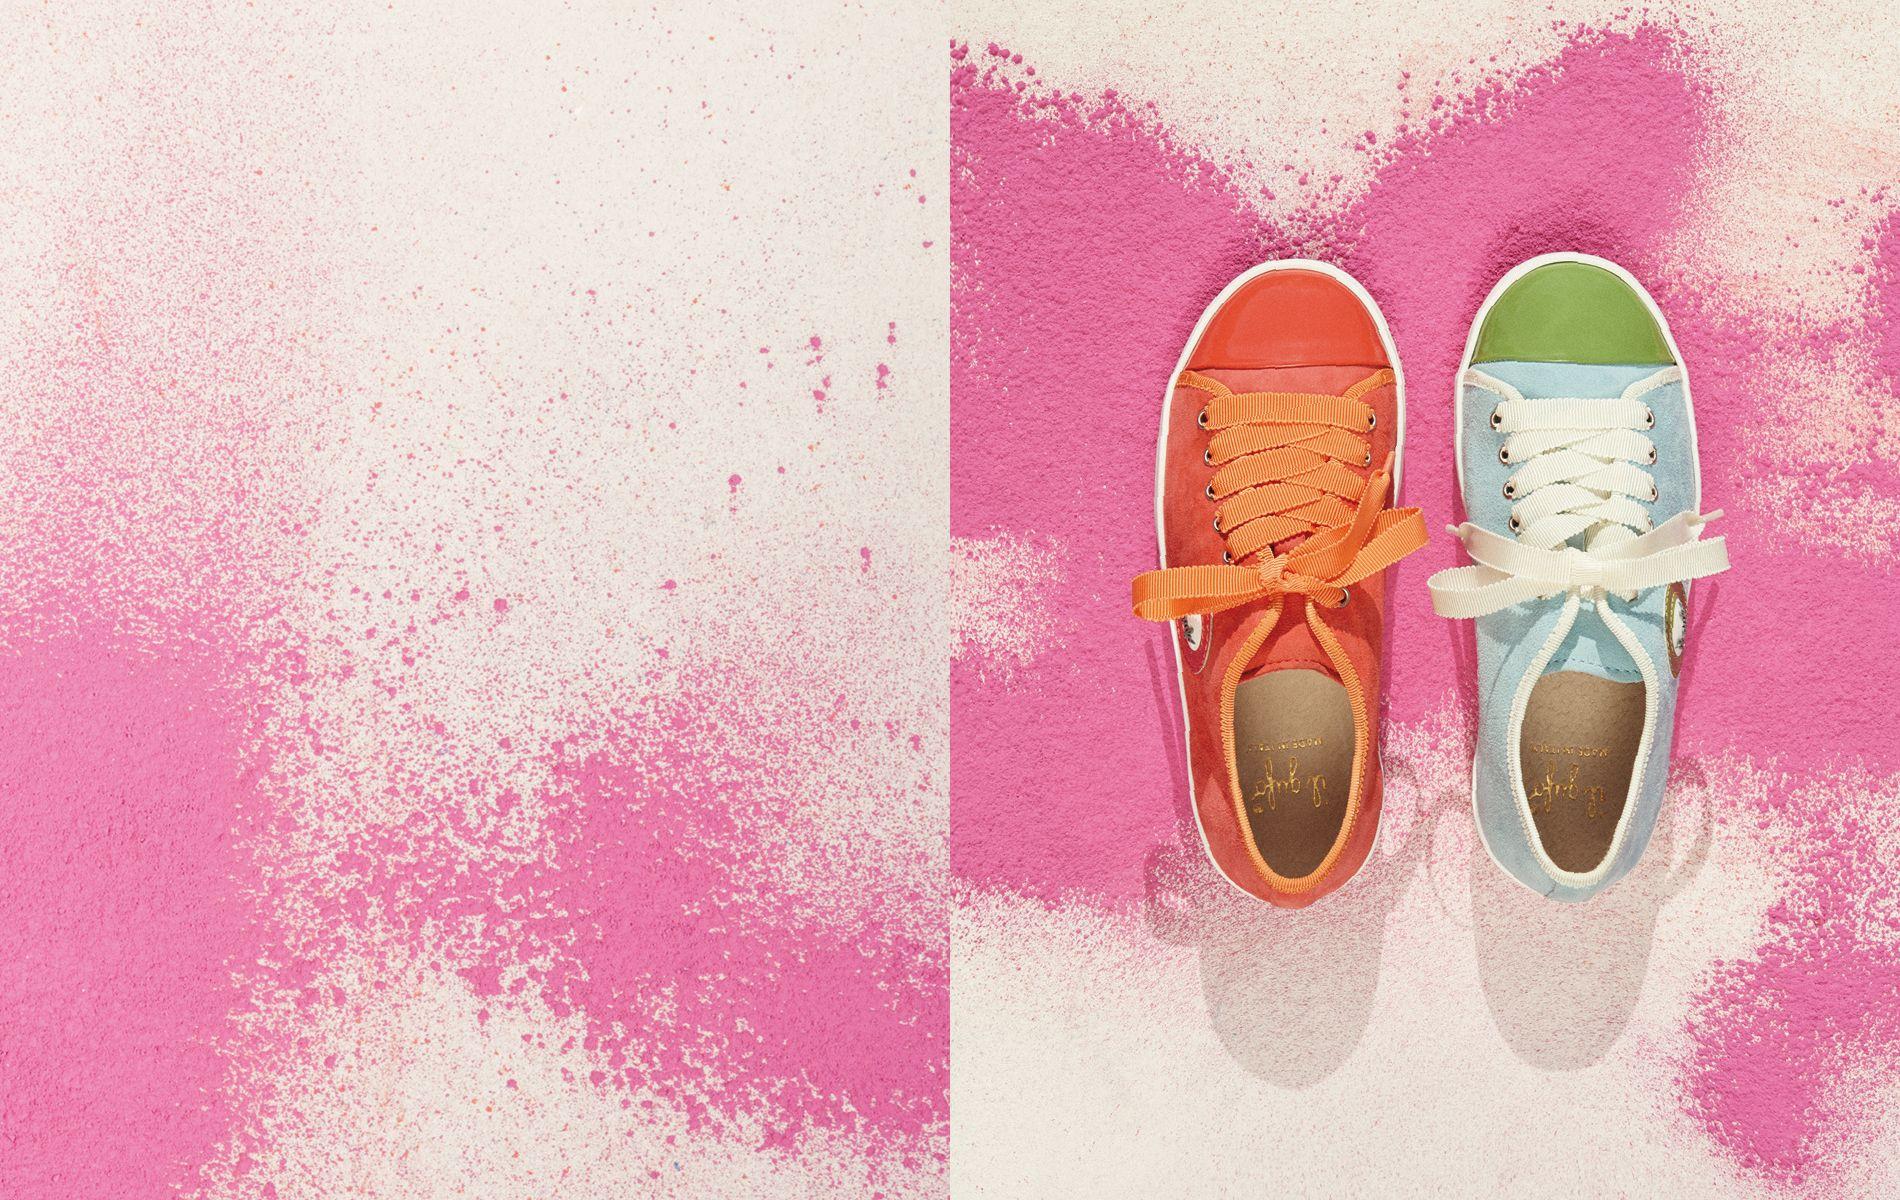 #ilgufo #ss14 #fashionkids #fashiongirls #kidswear #childrenswear #ilgufosummercolors #shoes #shoecollection #spring #summer